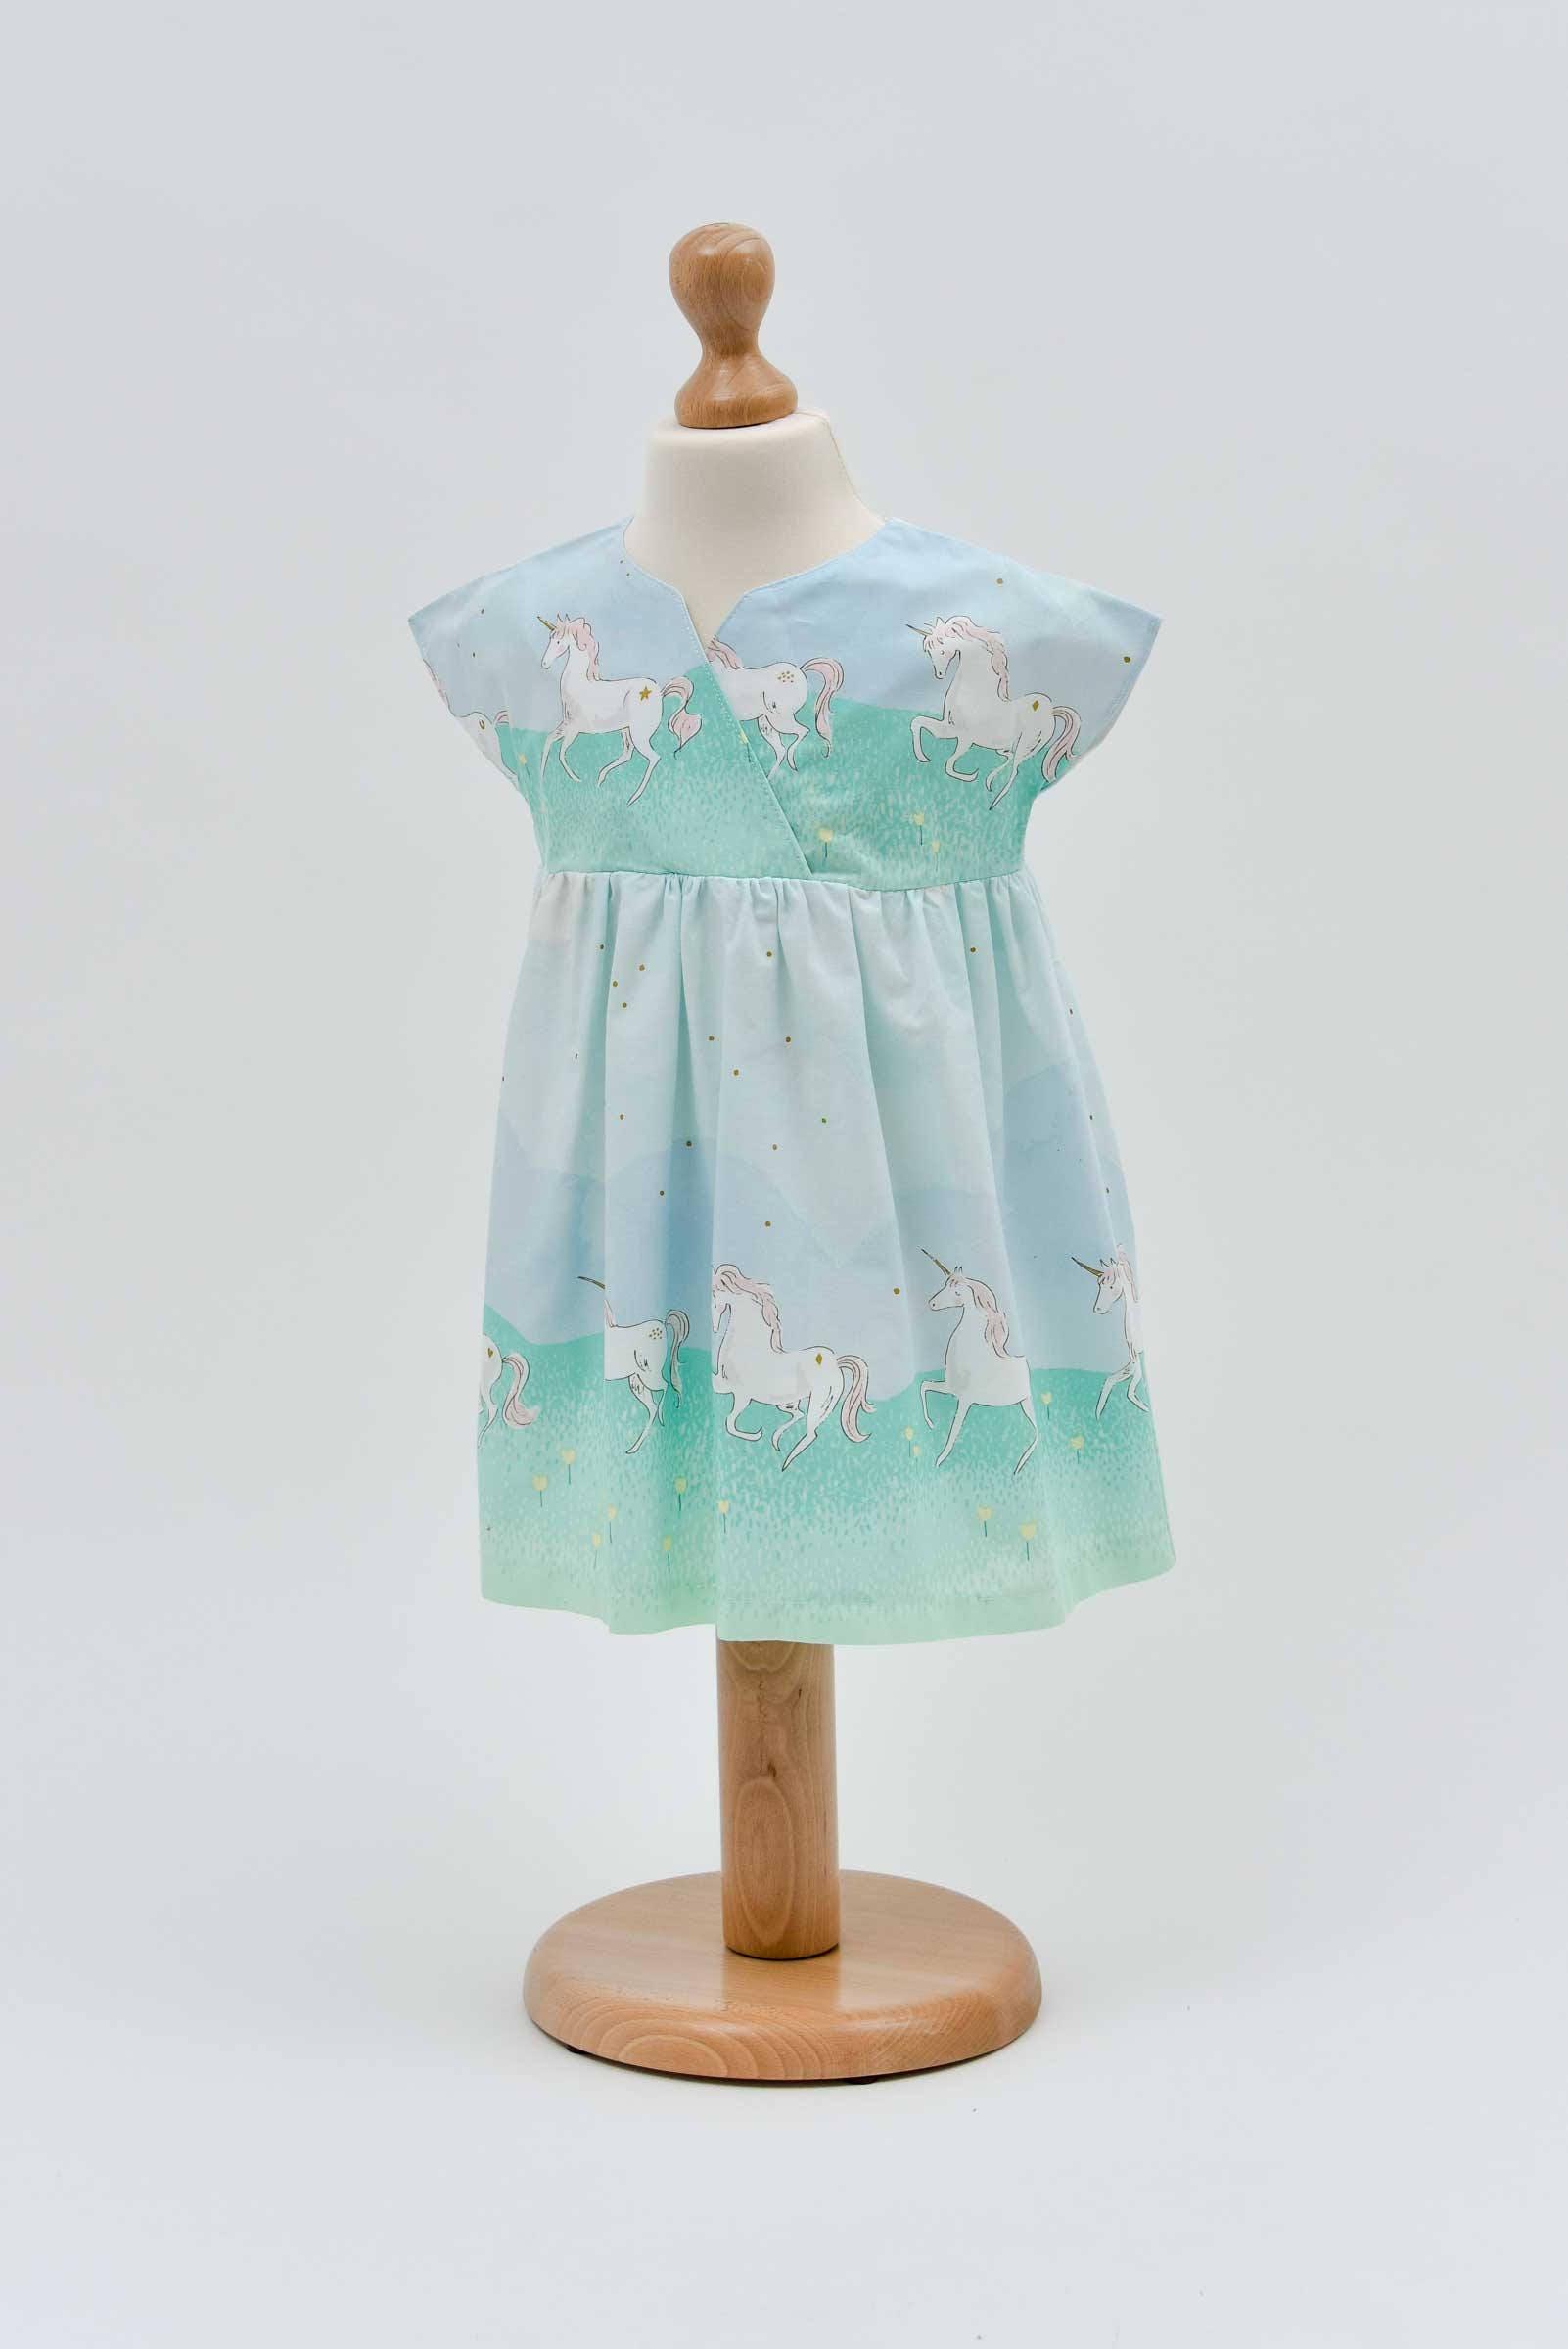 Outstanding Girls Tea Party Dress Photos - All Wedding Dresses ...